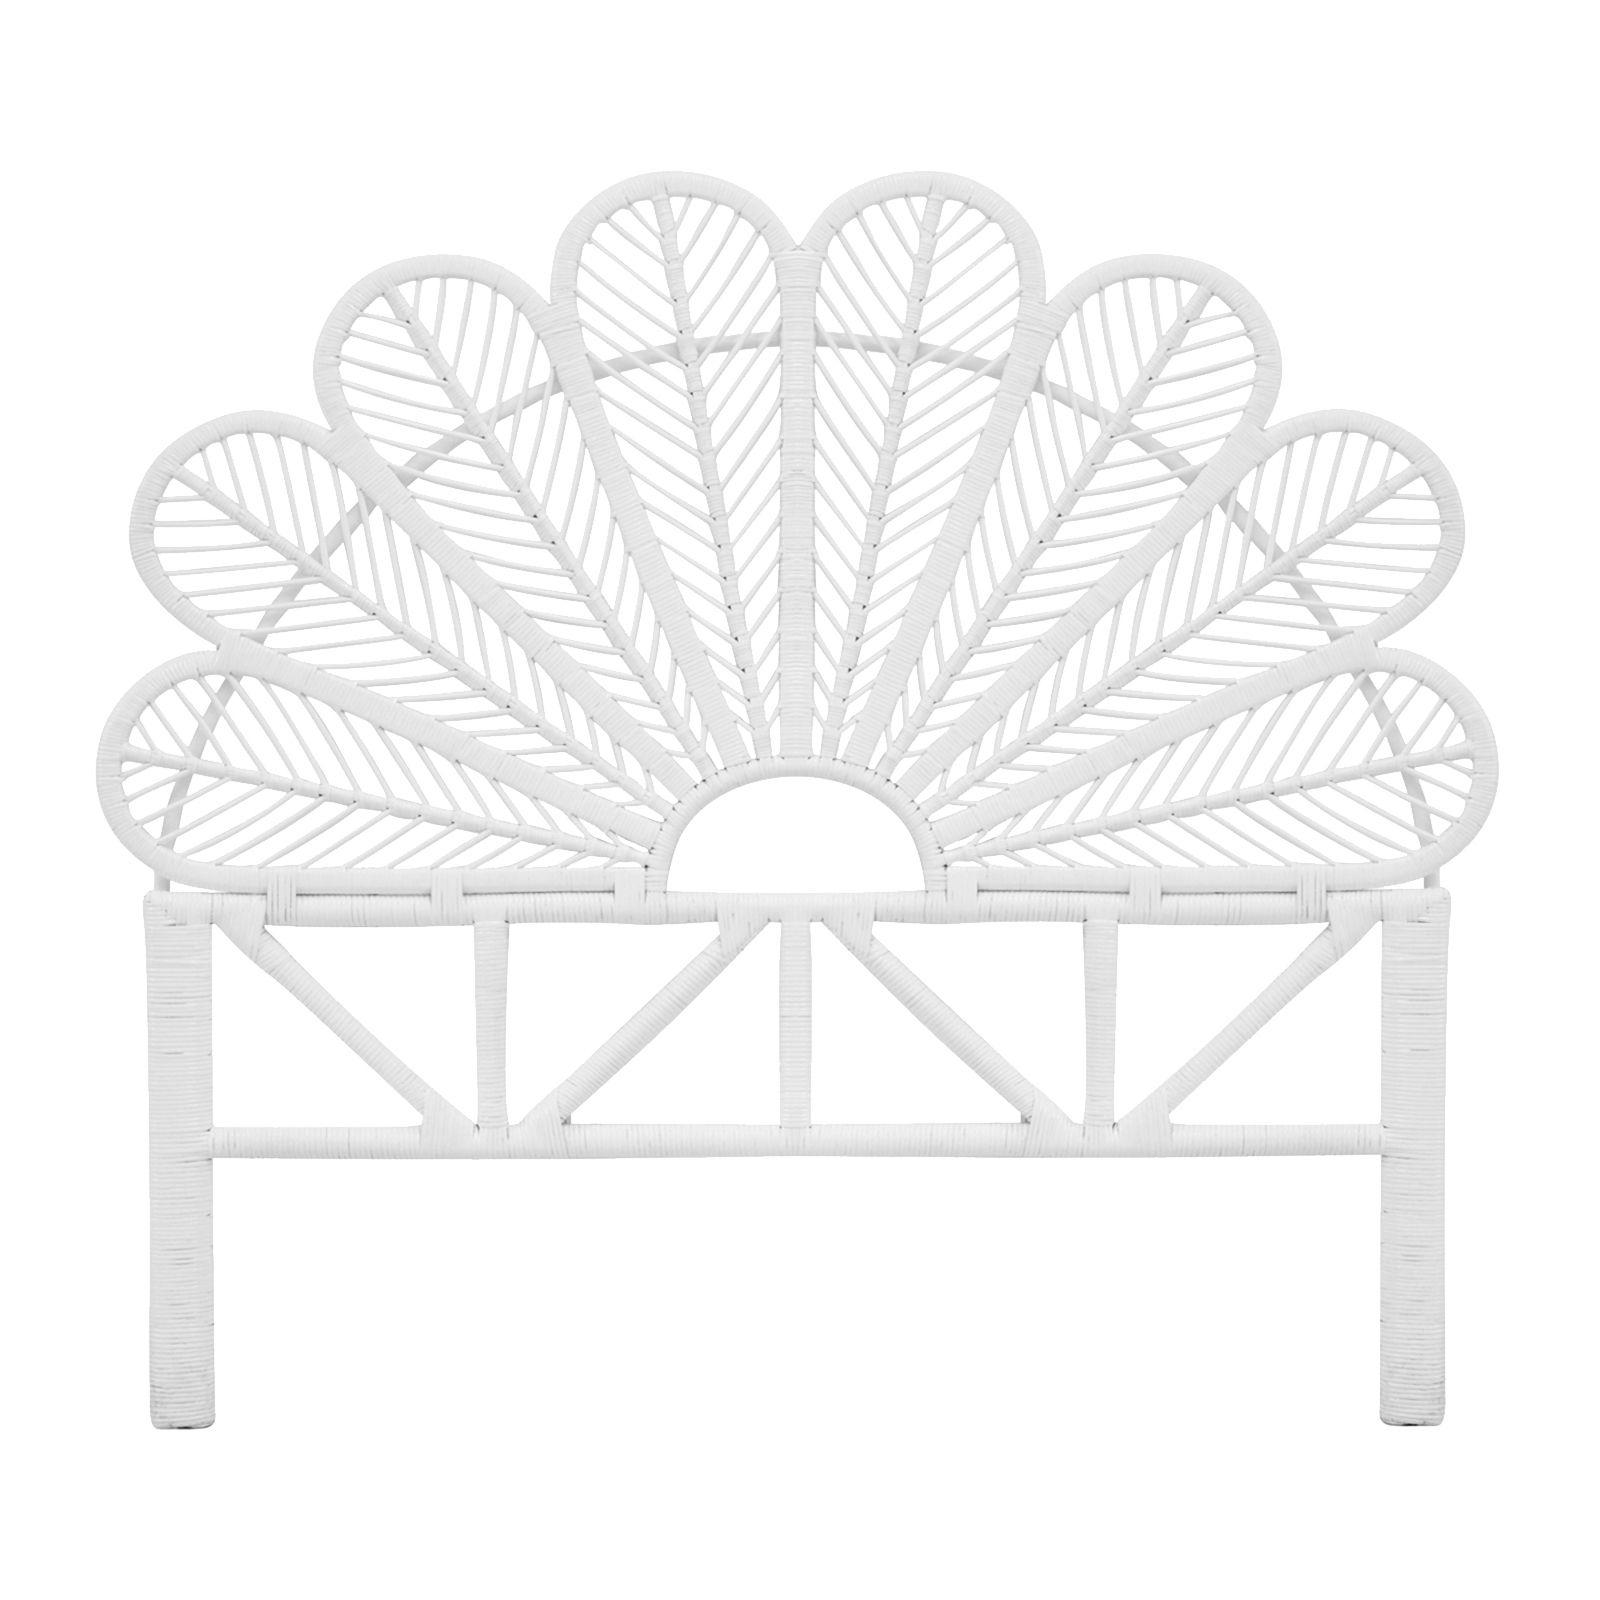 Queen Petal Bed Head White | CasaMaseeg | Pinterest | Cabeceras de ...